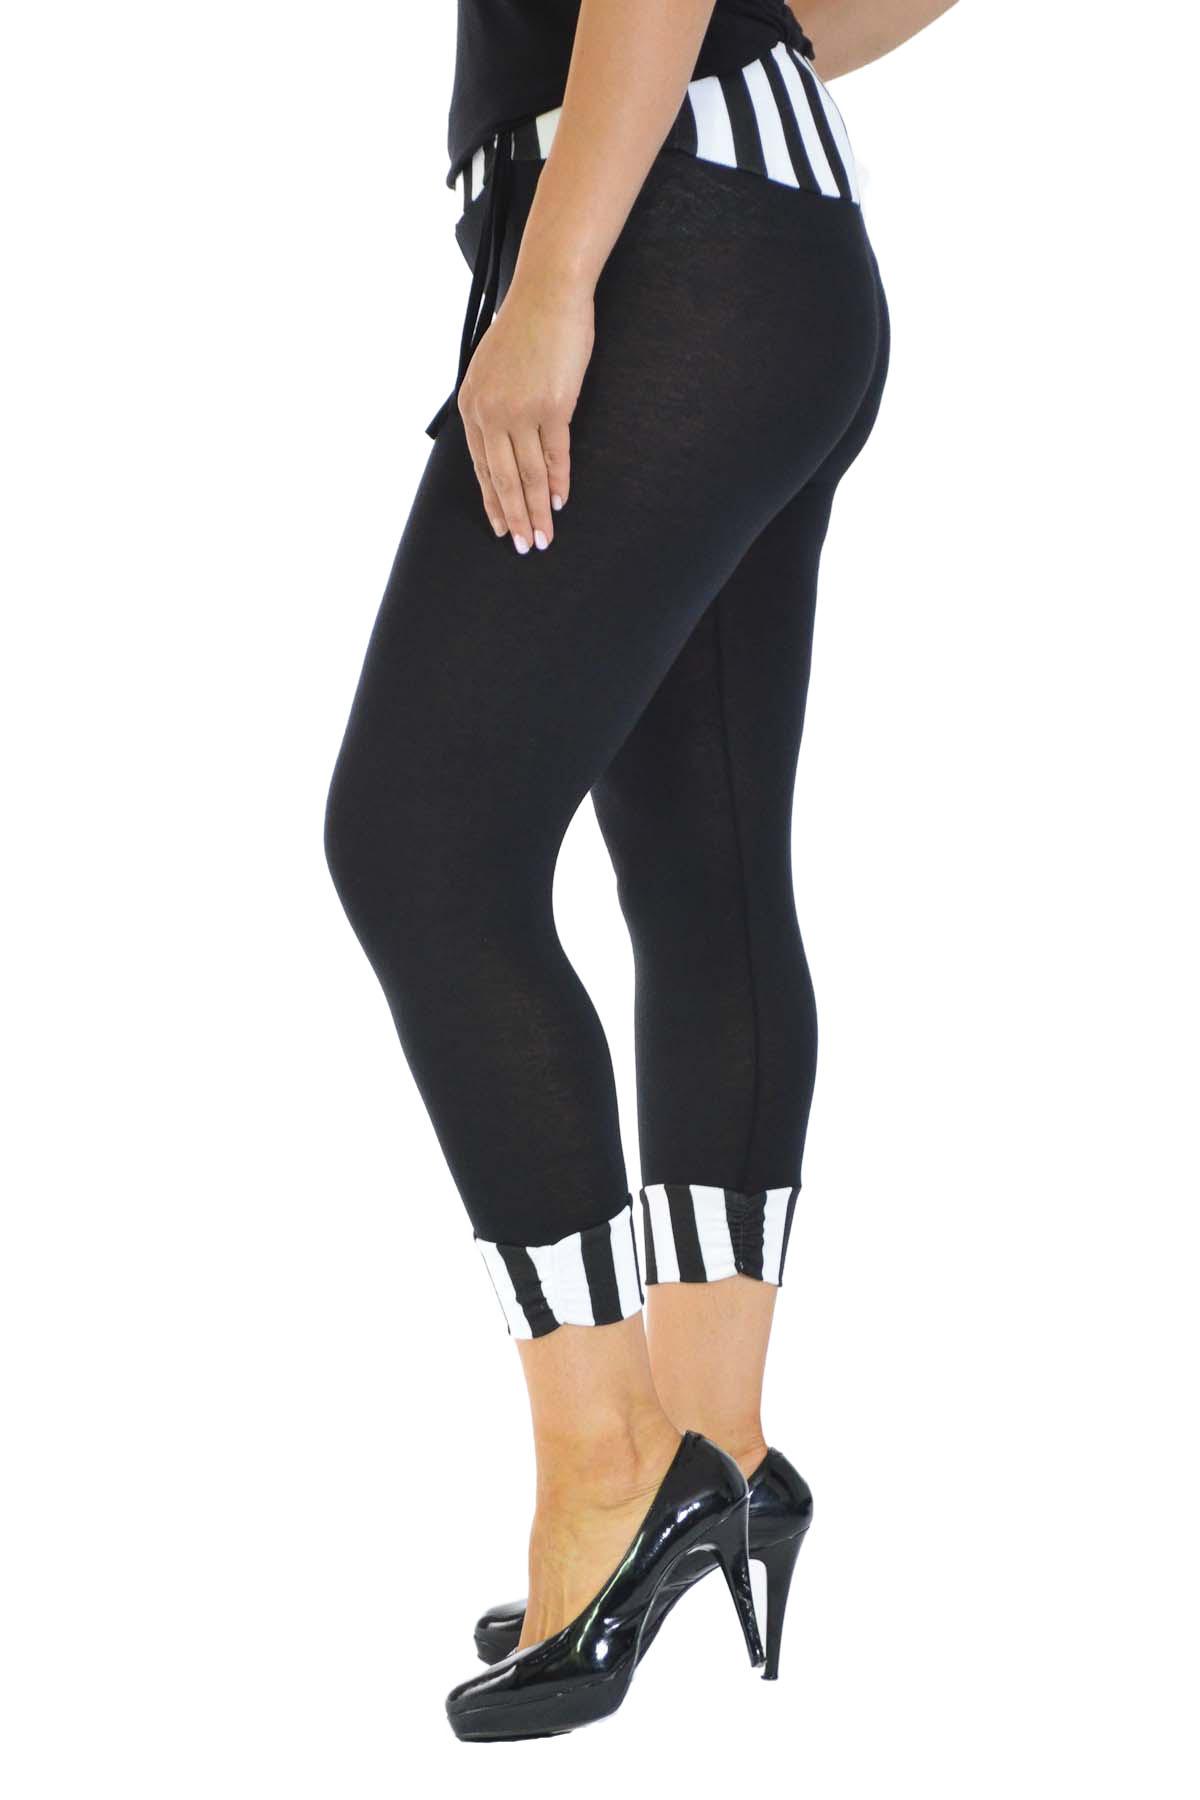 New-Womens-Plus-Size-Leggings-Ladies-Stripe-Print-Cropped-Trouser-Waist-Nouvelle thumbnail 3